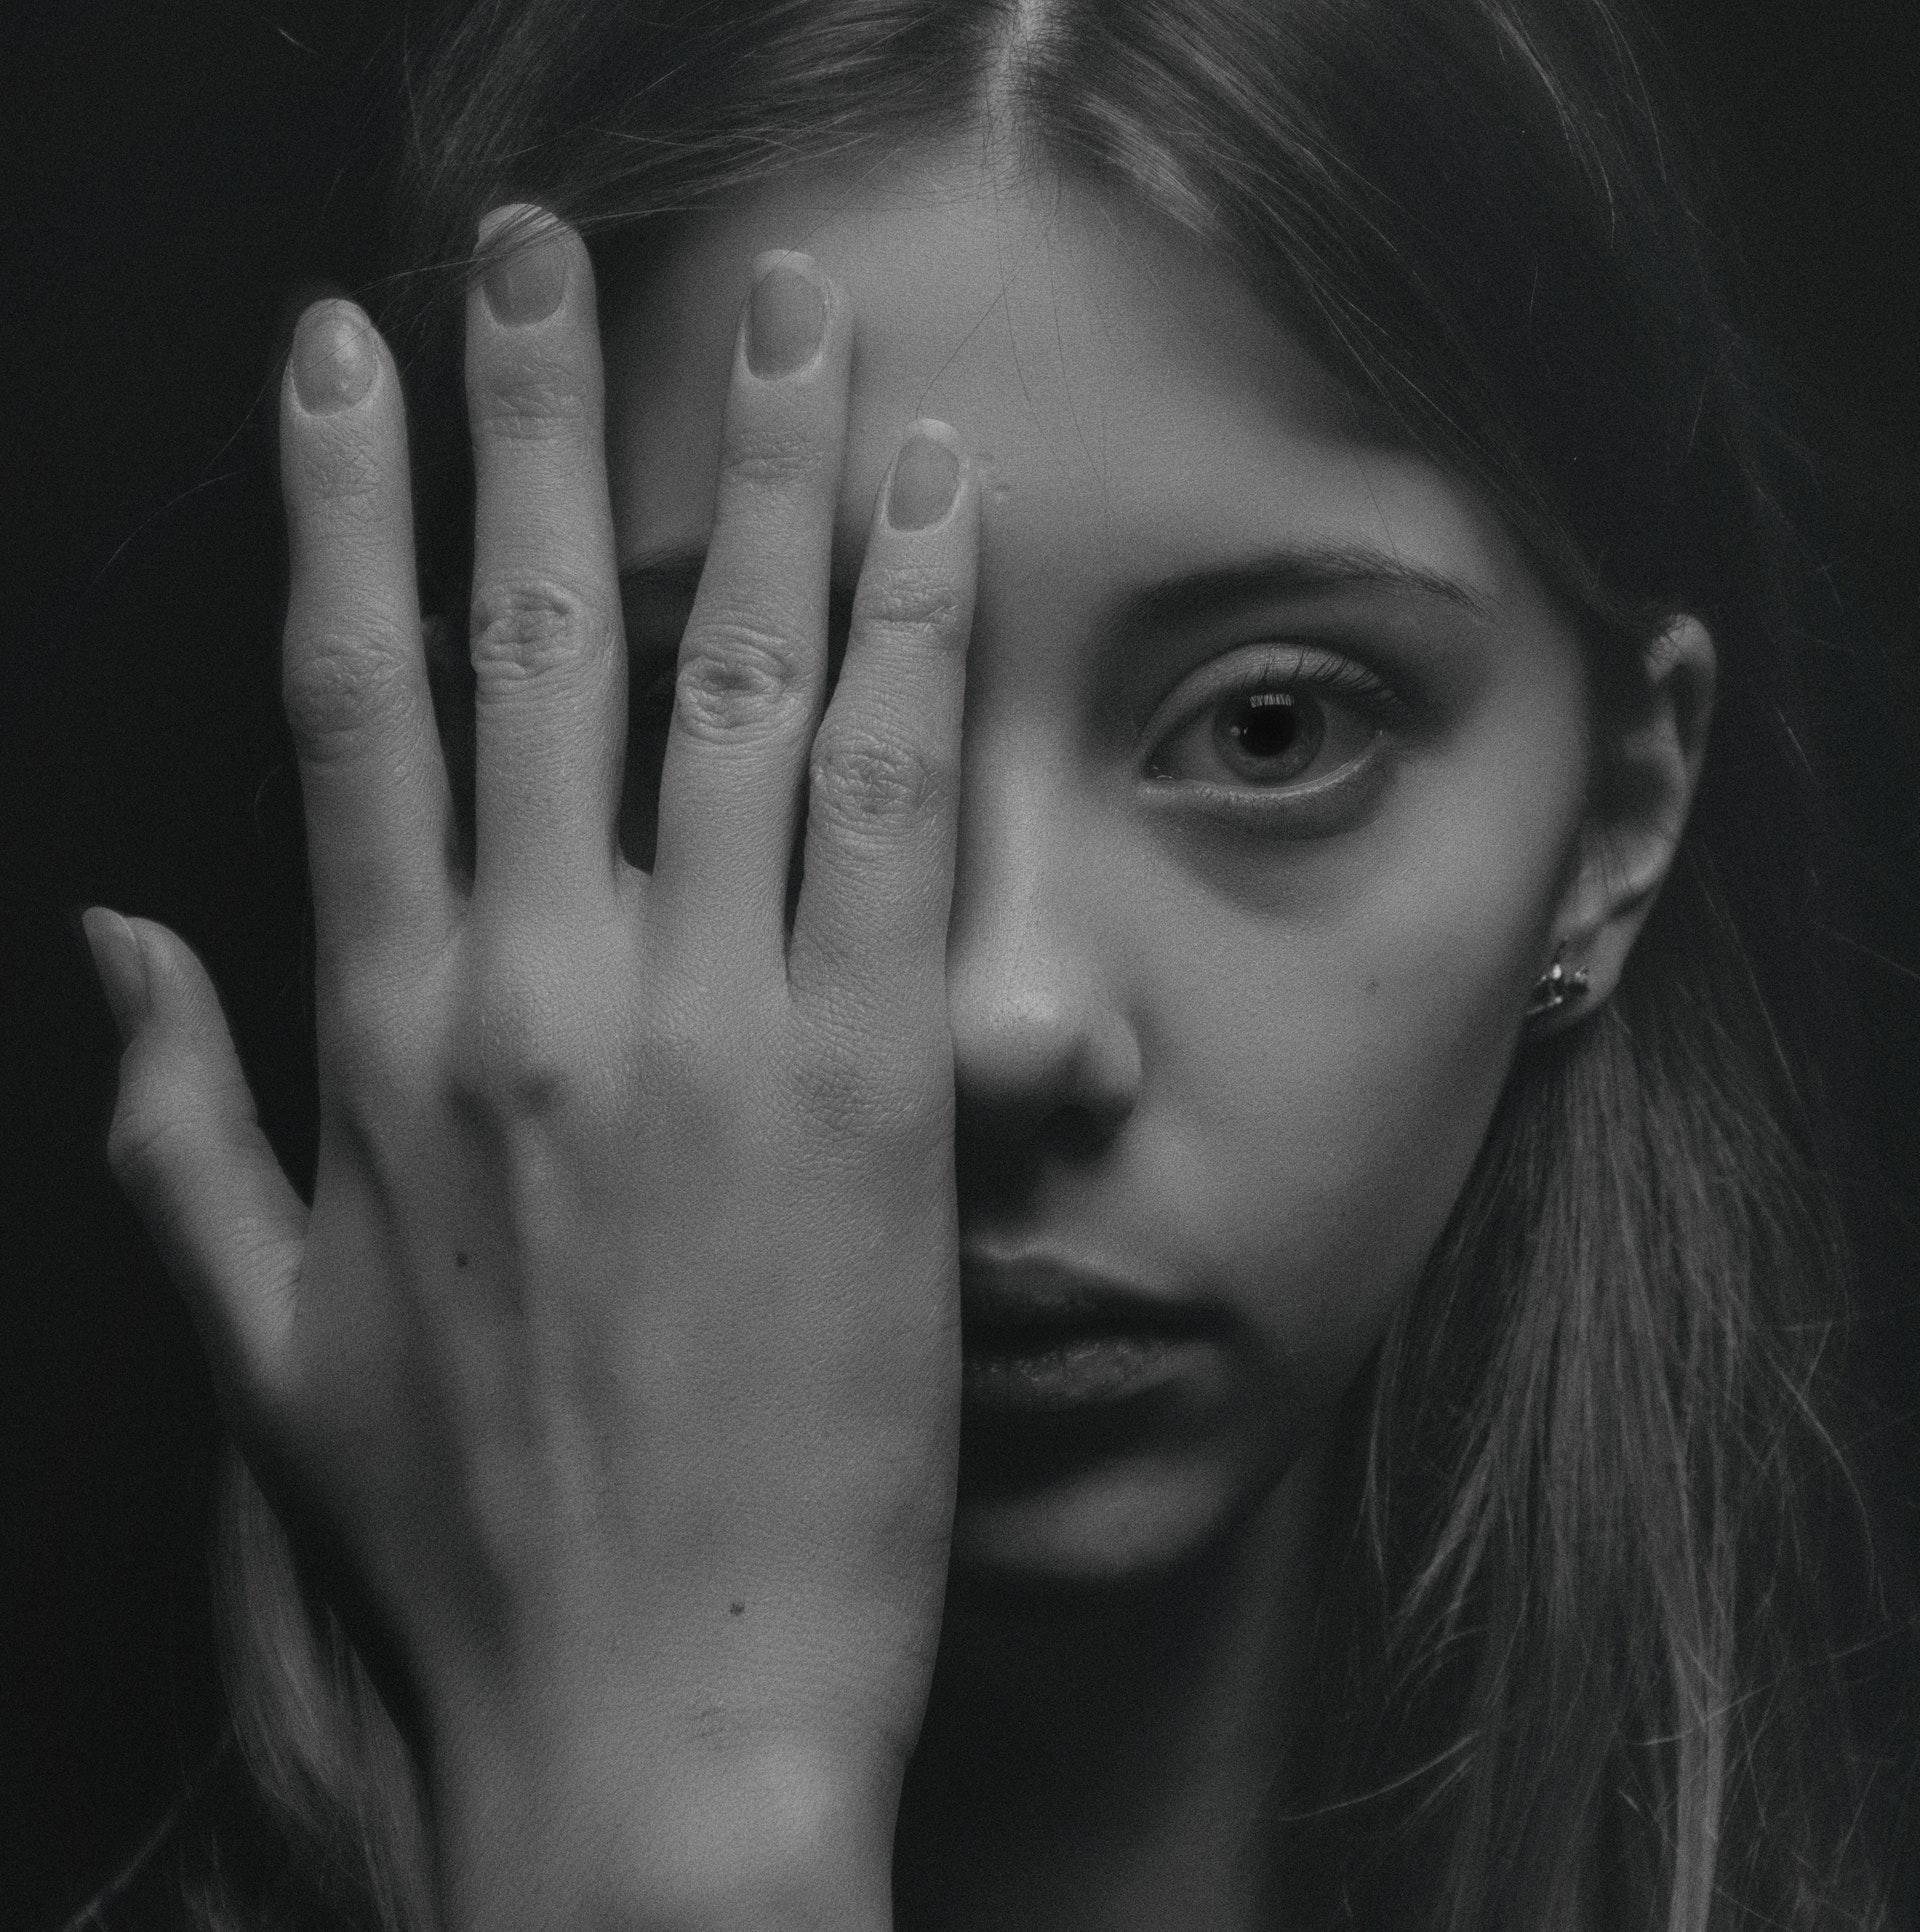 Beeldbankfoto van jonge vrouw die haar oog afdekt met haar hand. Photo by Alexander Krivitskiy from Pexels.